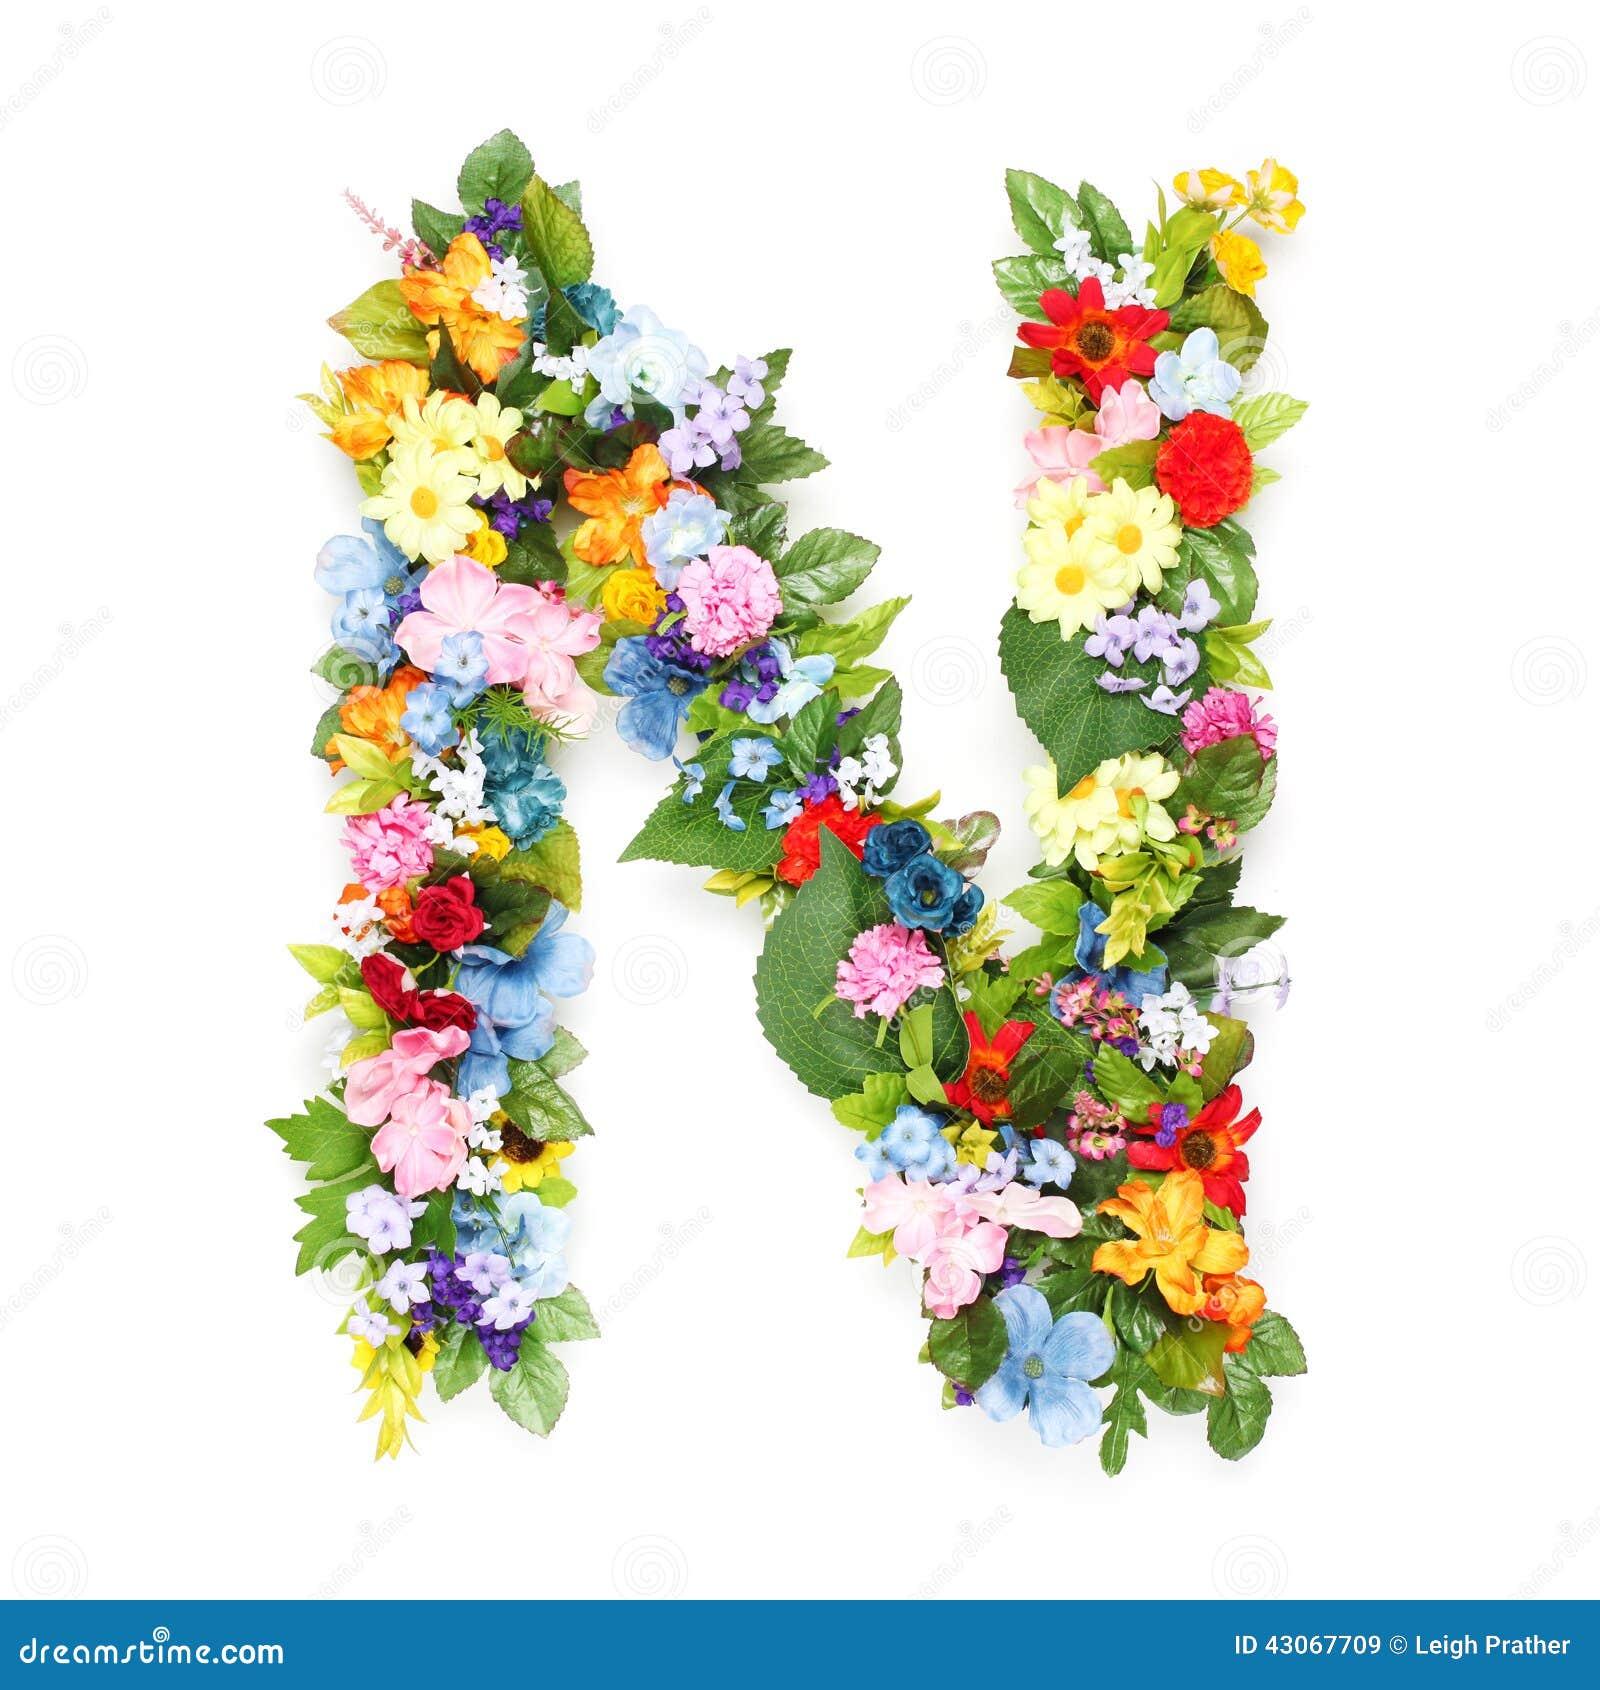 lettres des feuilles et des fleurs image stock image du lame jardin 43067709. Black Bedroom Furniture Sets. Home Design Ideas